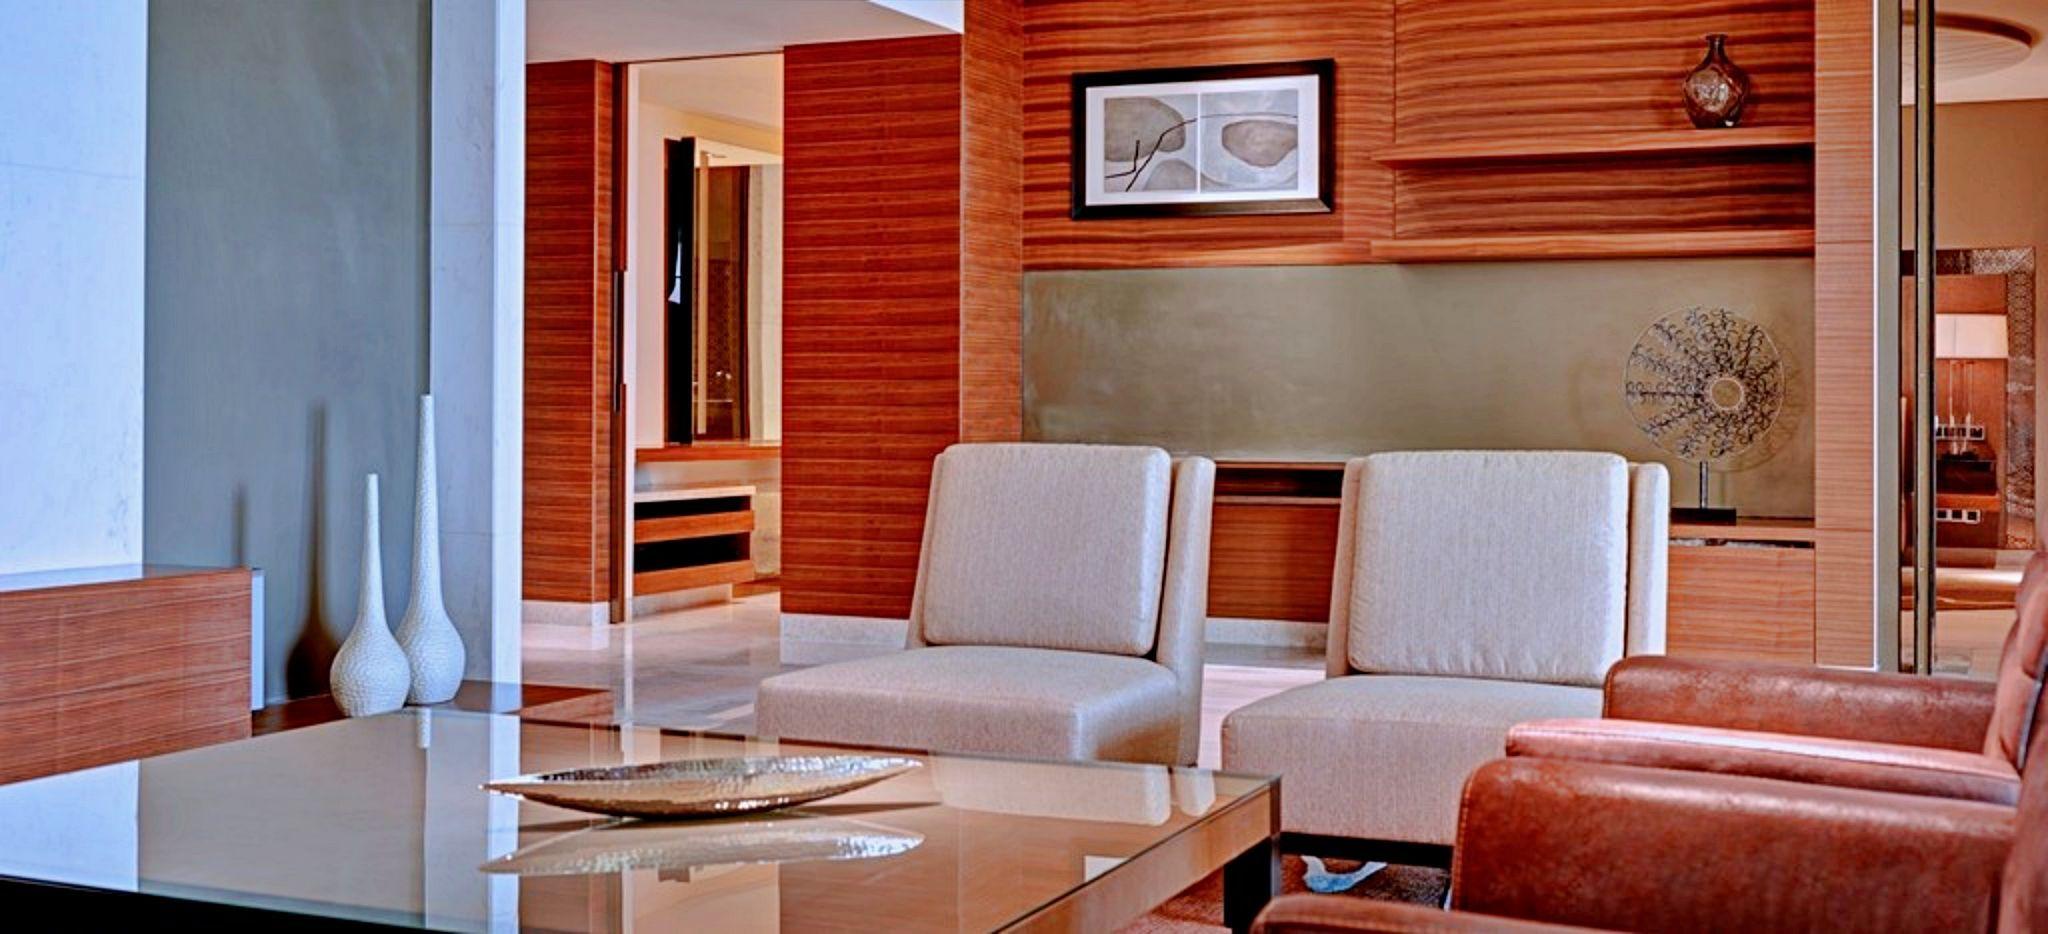 Lounge der Diplomat Suite im Hotel Park Hyatt Abu Dhabi